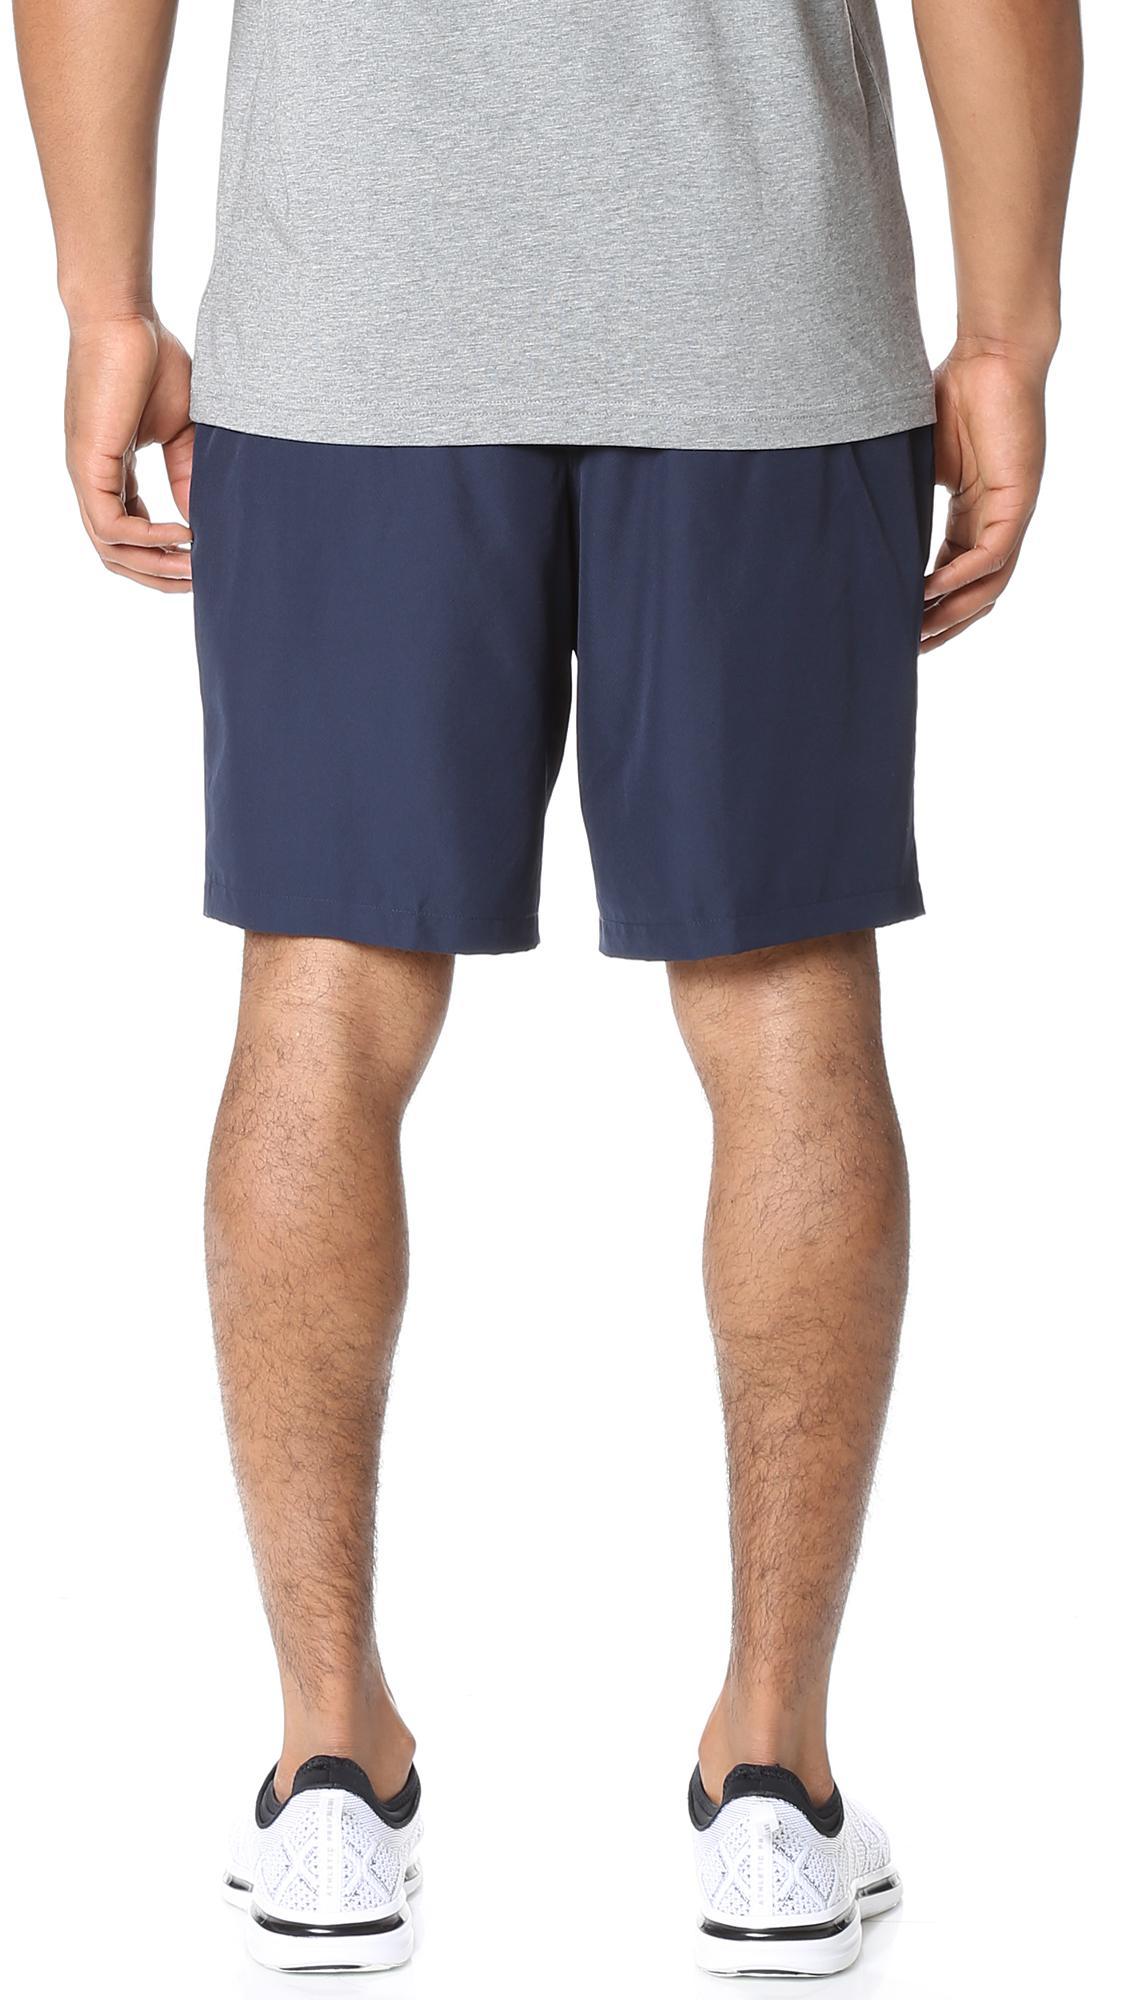 f6aae98cde4e9 Lacoste - Blue Diamond Weave Taffeta Tennis Shorts for Men - Lyst. View  fullscreen